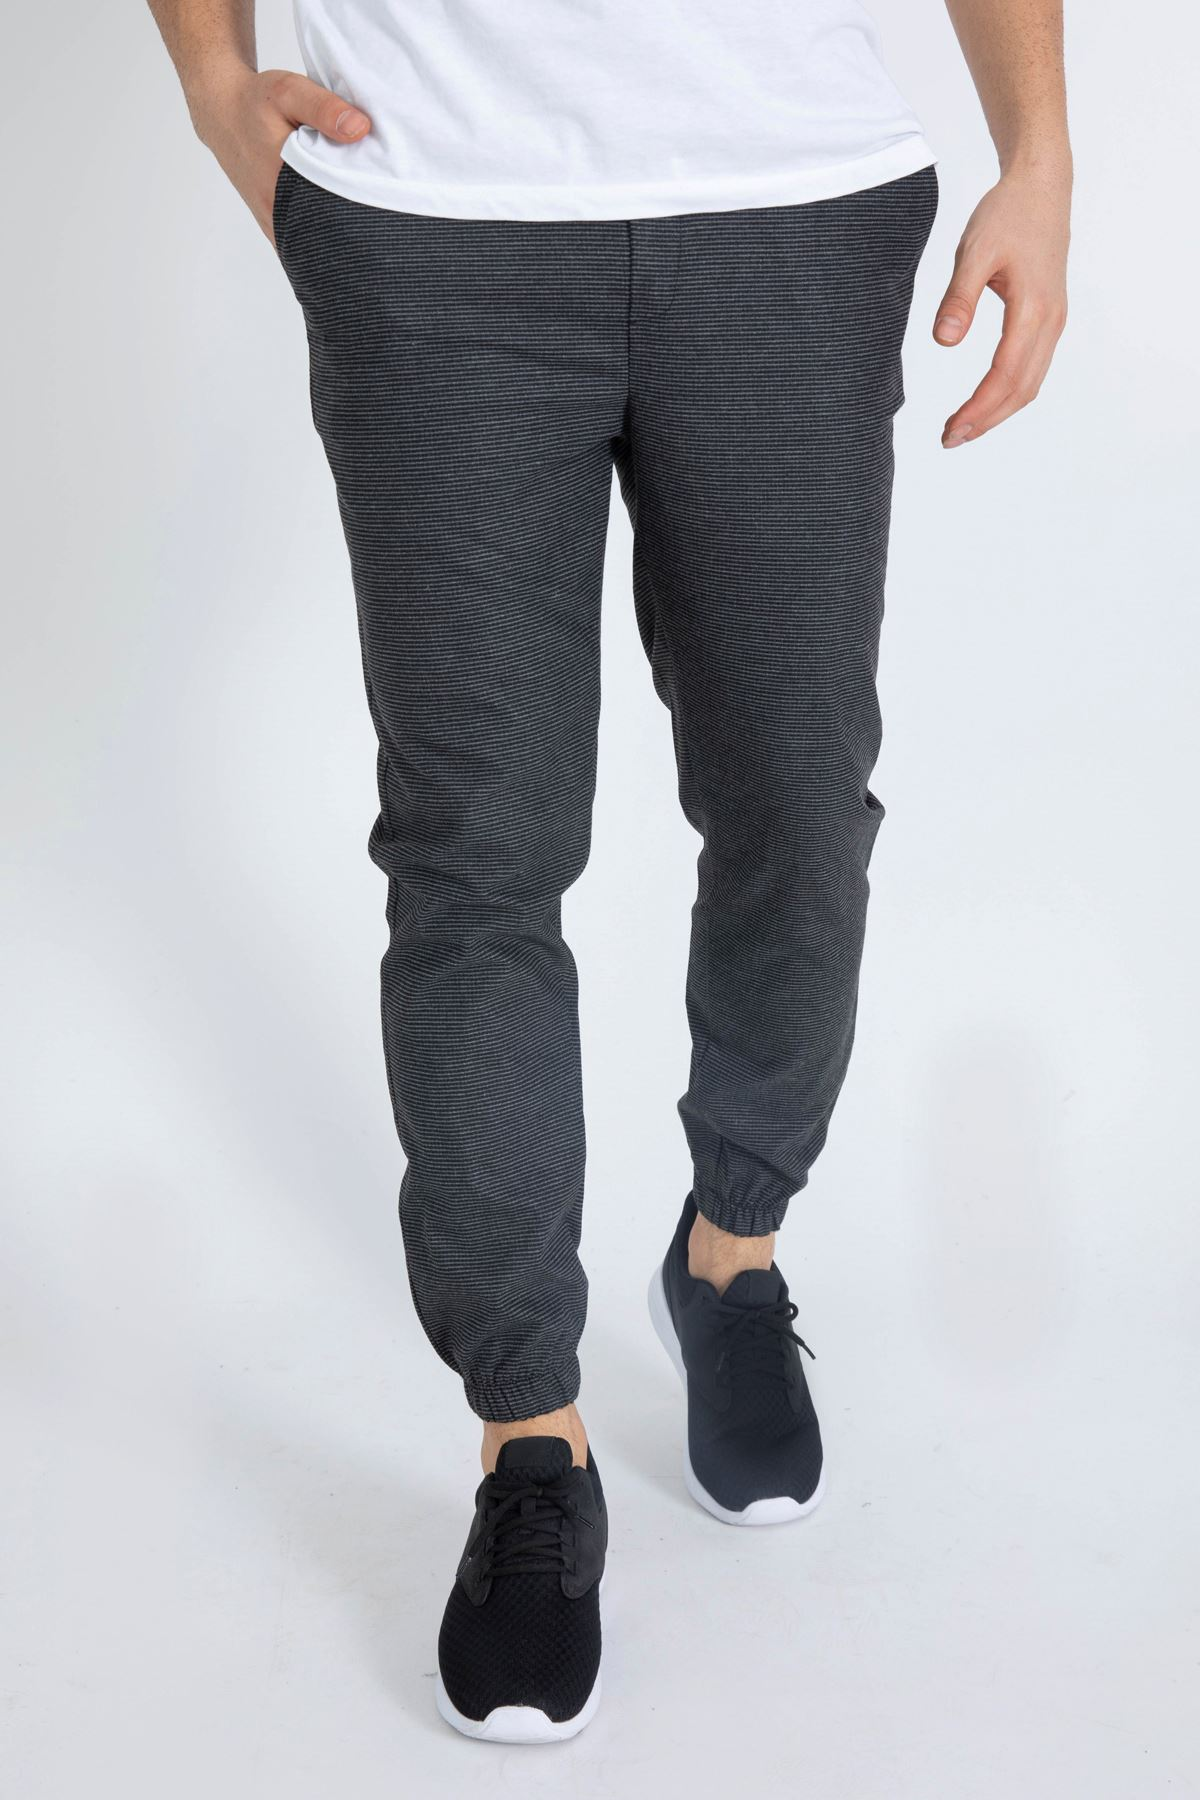 Erkek Beli Lastikli Pöti Kareli Siyah Jogger Pantolon